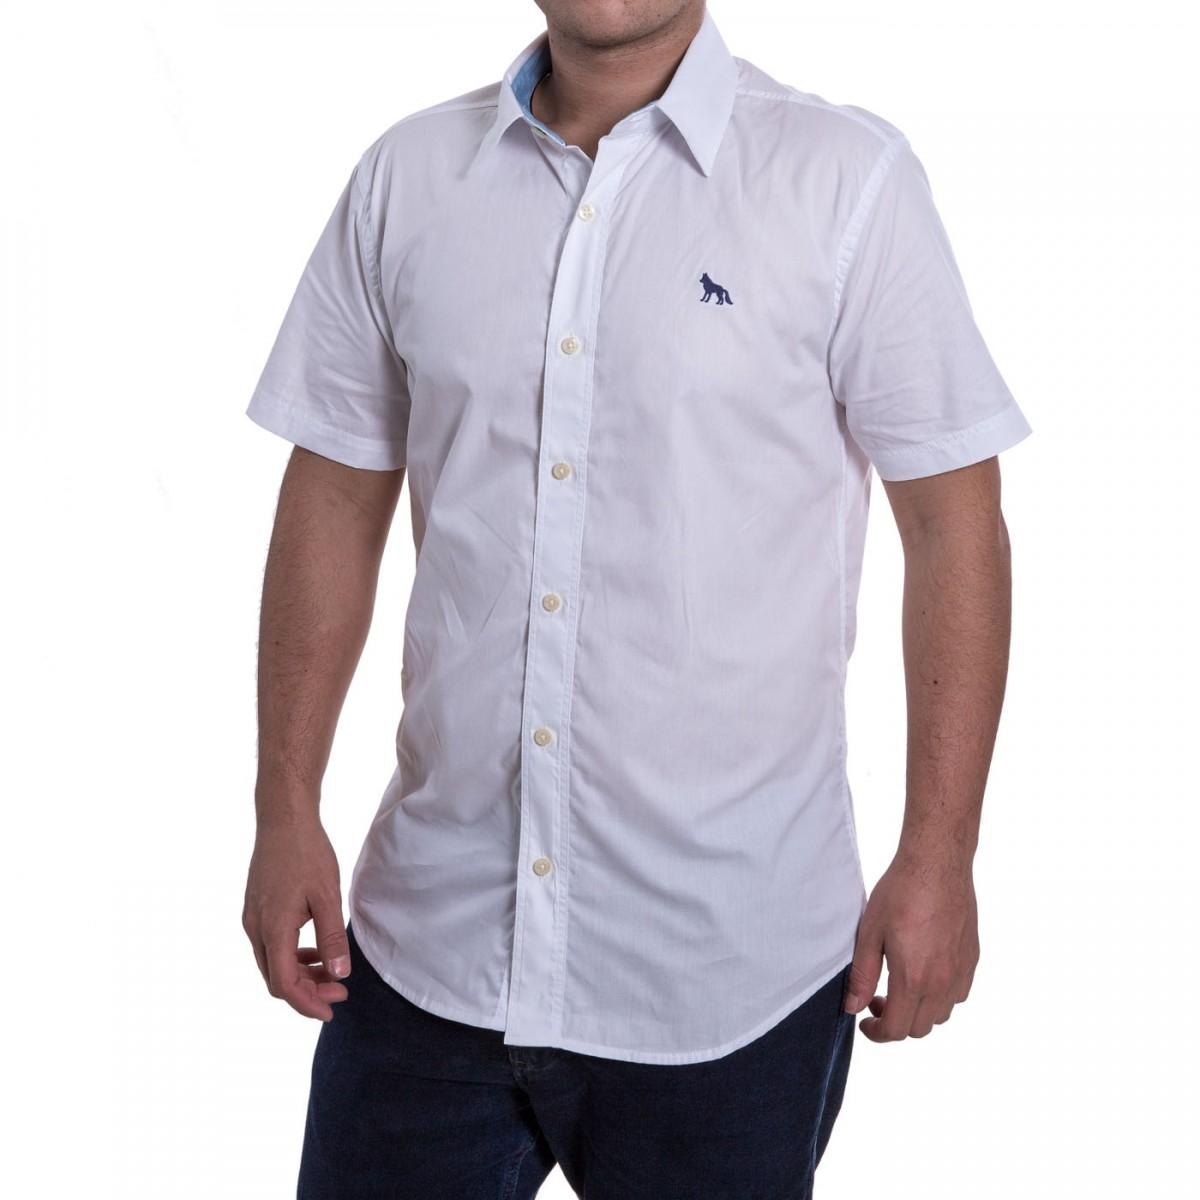 0b9b5ca4c Bizz Store - Camisa Social Masculina Acostamento Manga Curta